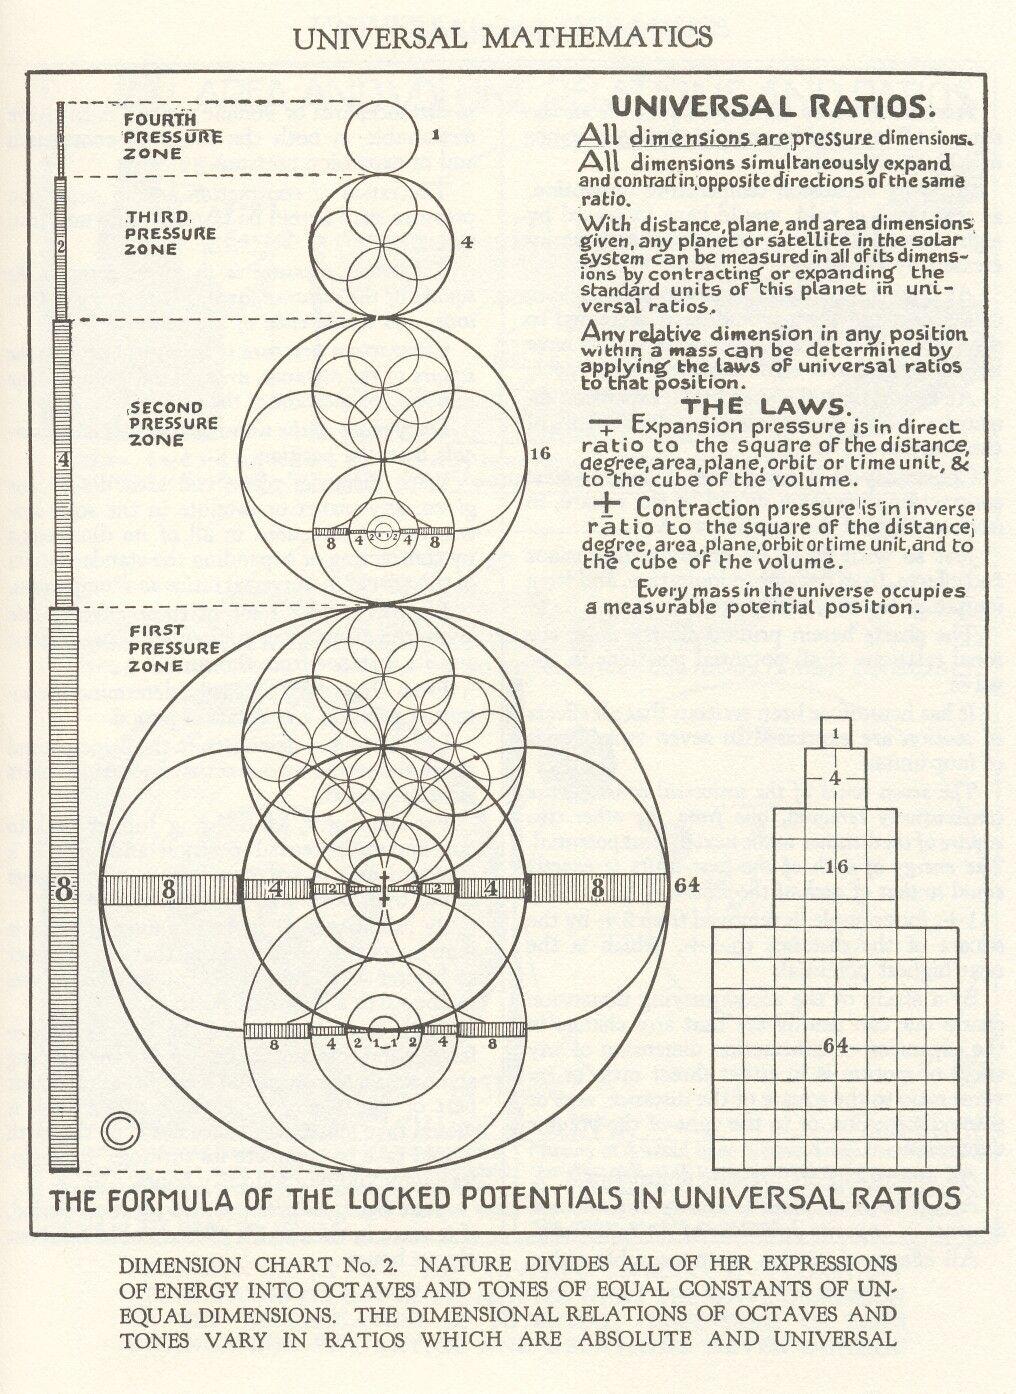 Walter russell universal mathematics the formula of the locked walter russell universal mathematics the formula of the locked potentials in universal ratios gamestrikefo Images